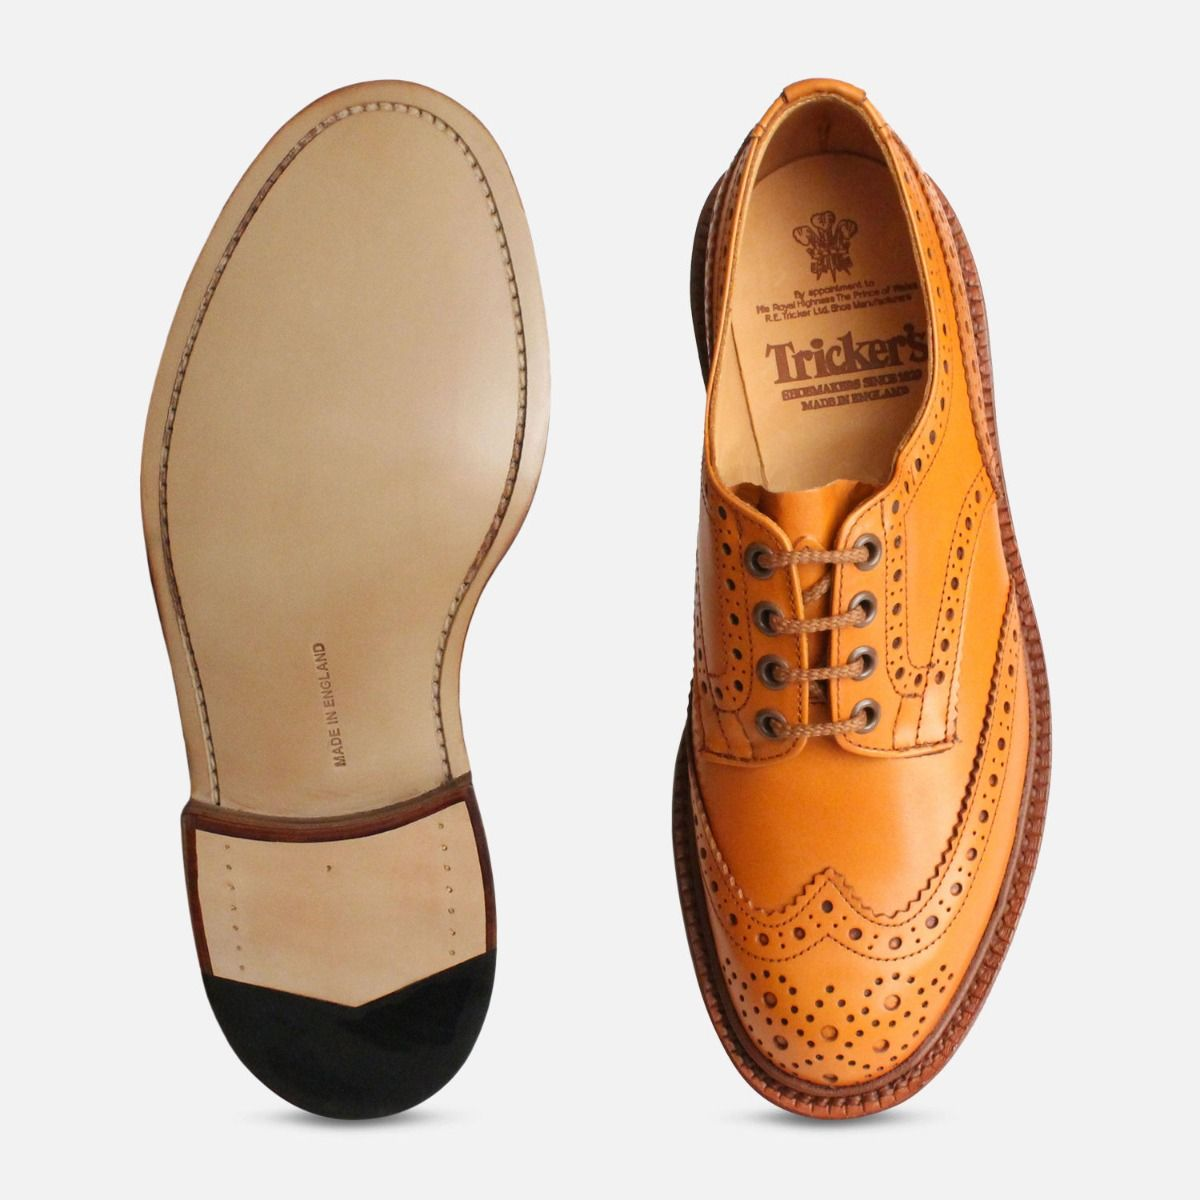 Trickers Bourton Acorn Brogue Shoes